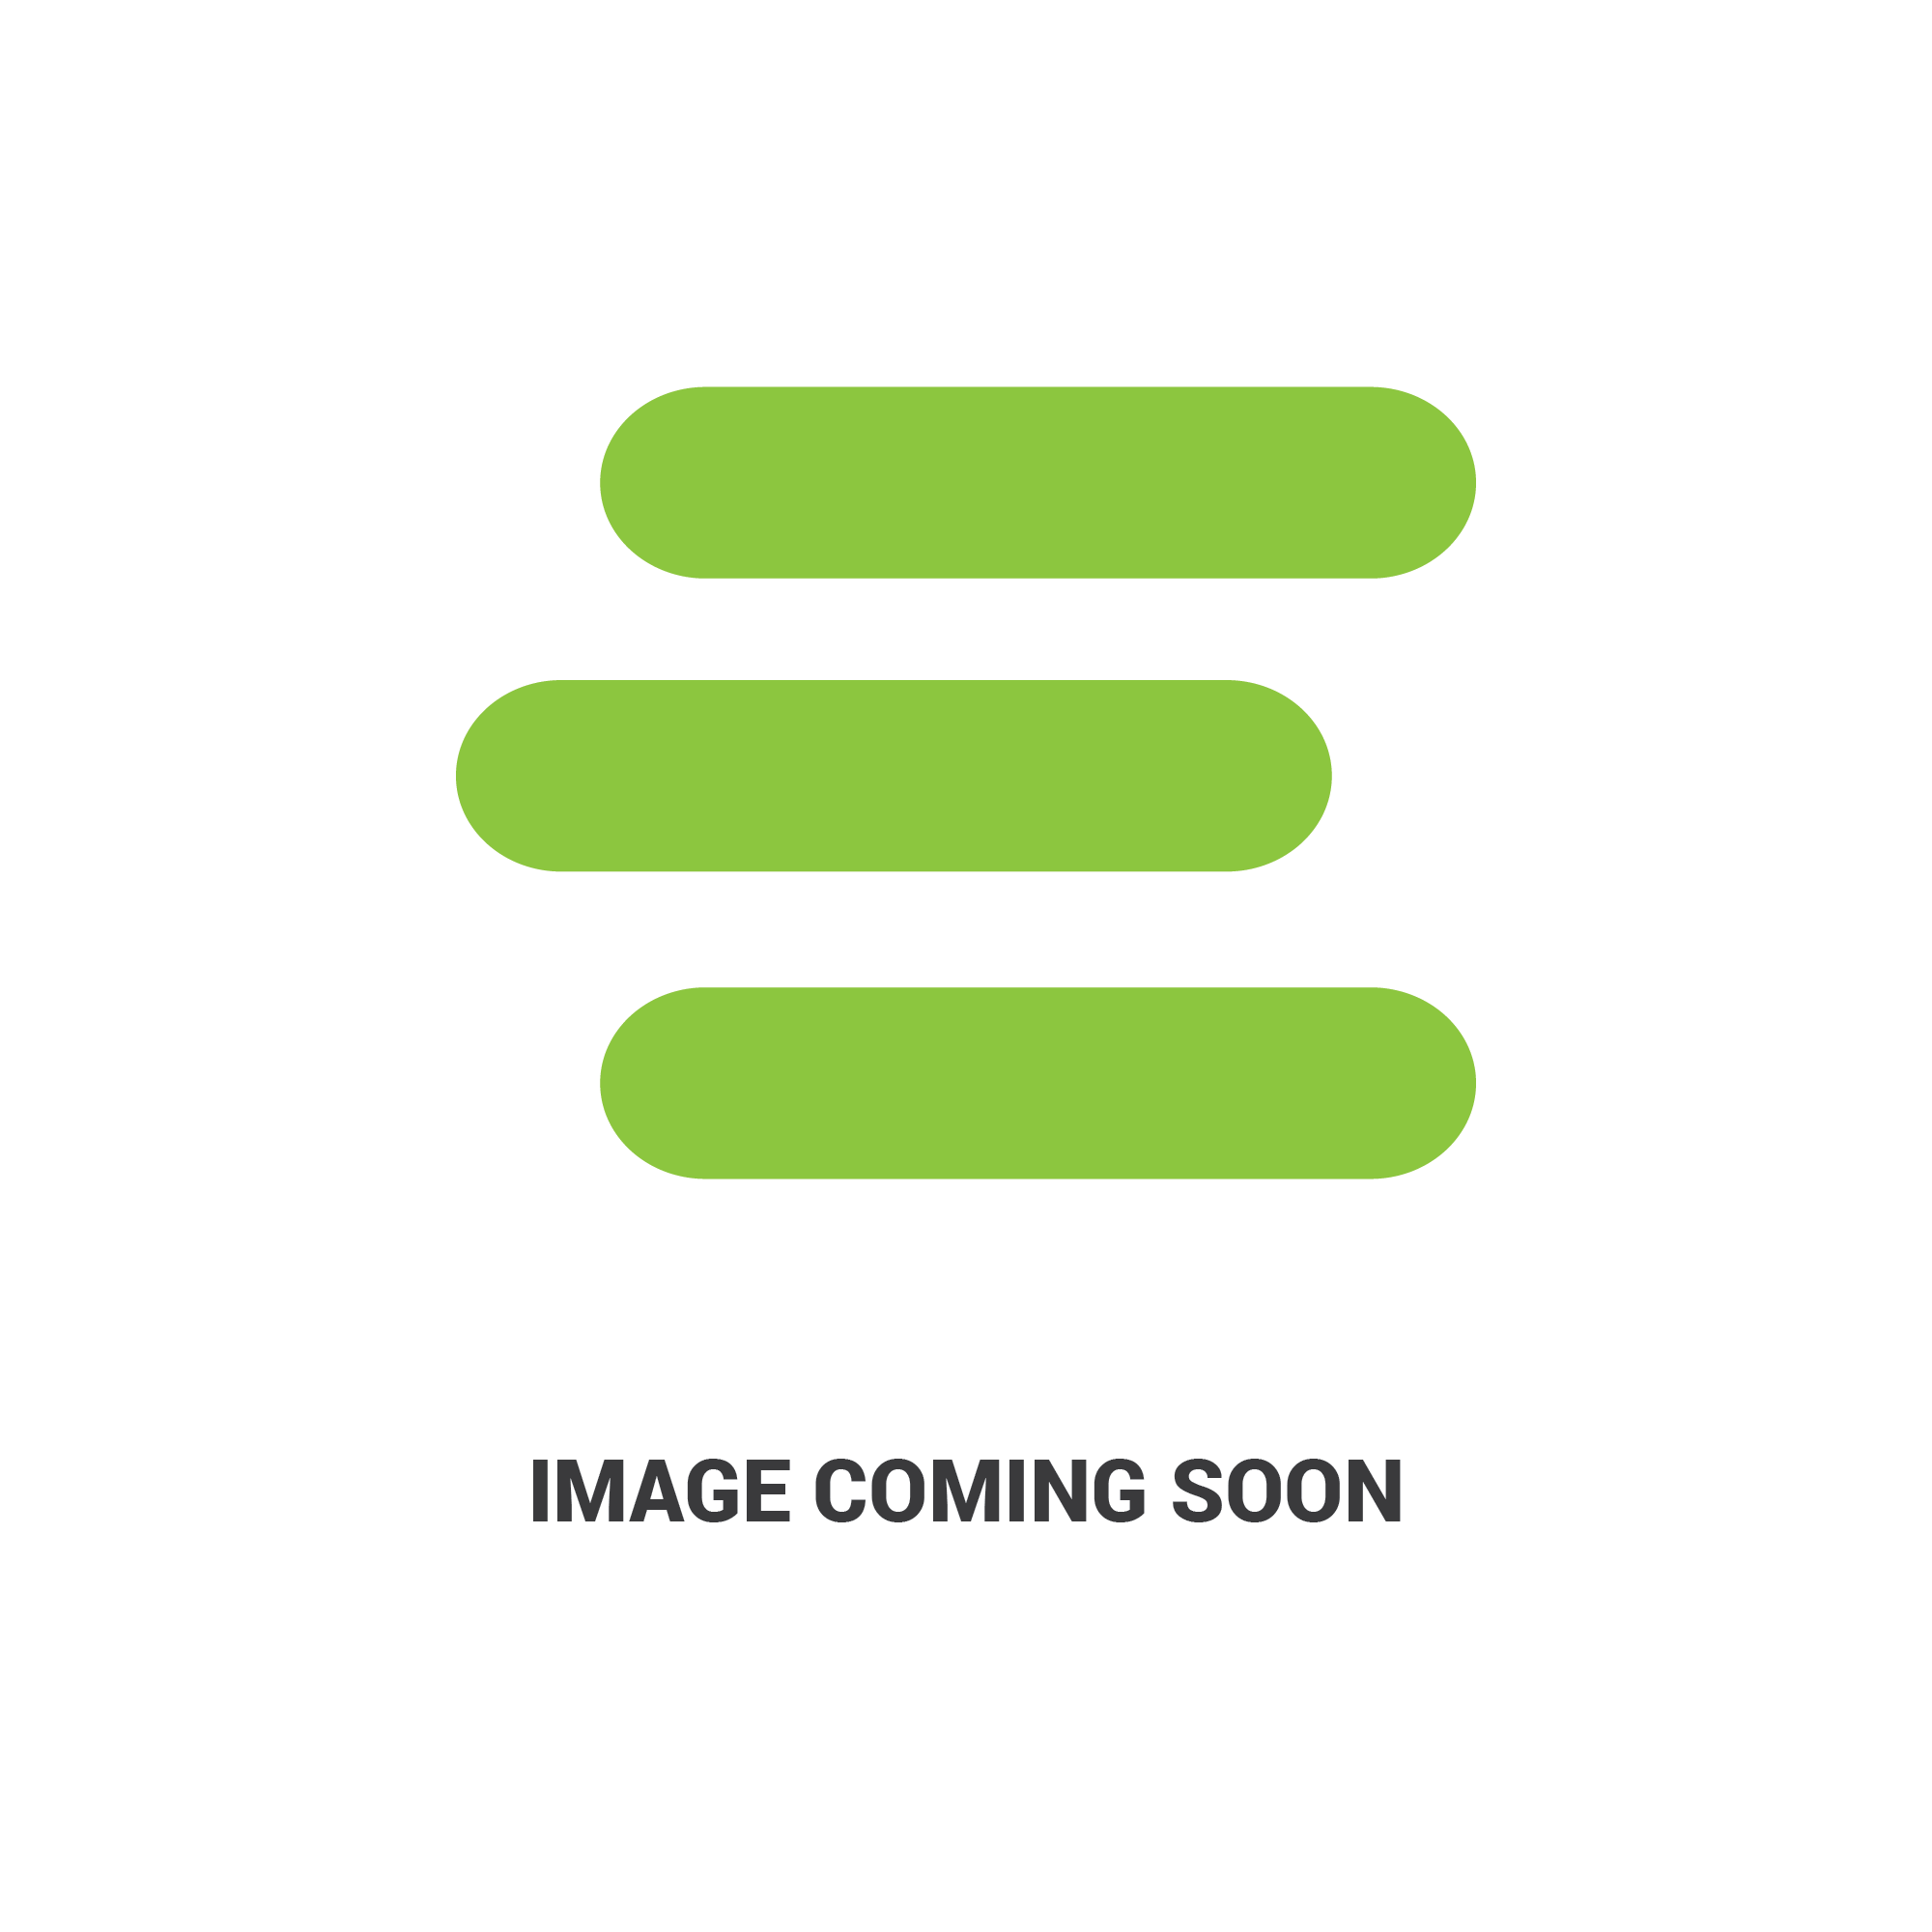 E-1437434edit 1.jpg